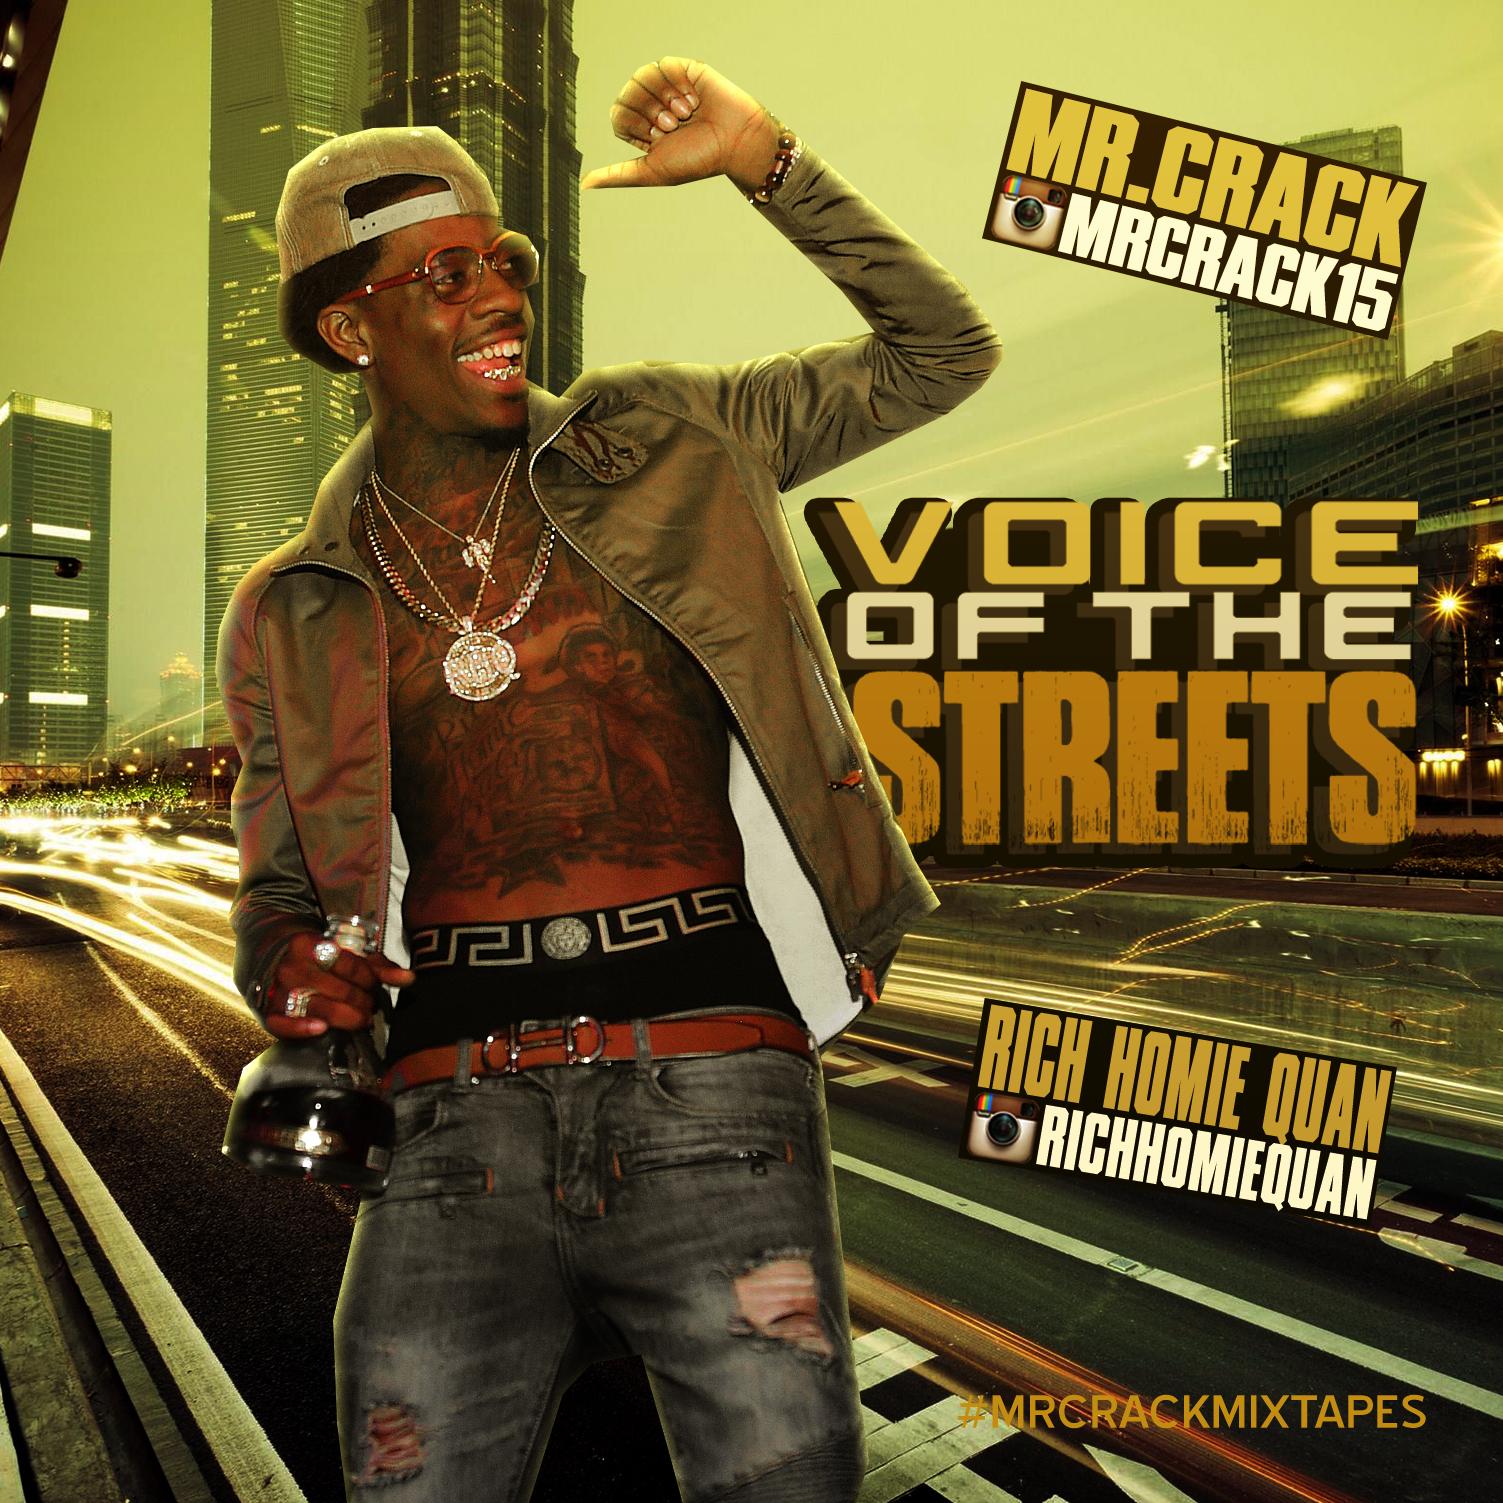 Rich Homie Quan - Voice Of The Streets 2 | Buymixtapes com